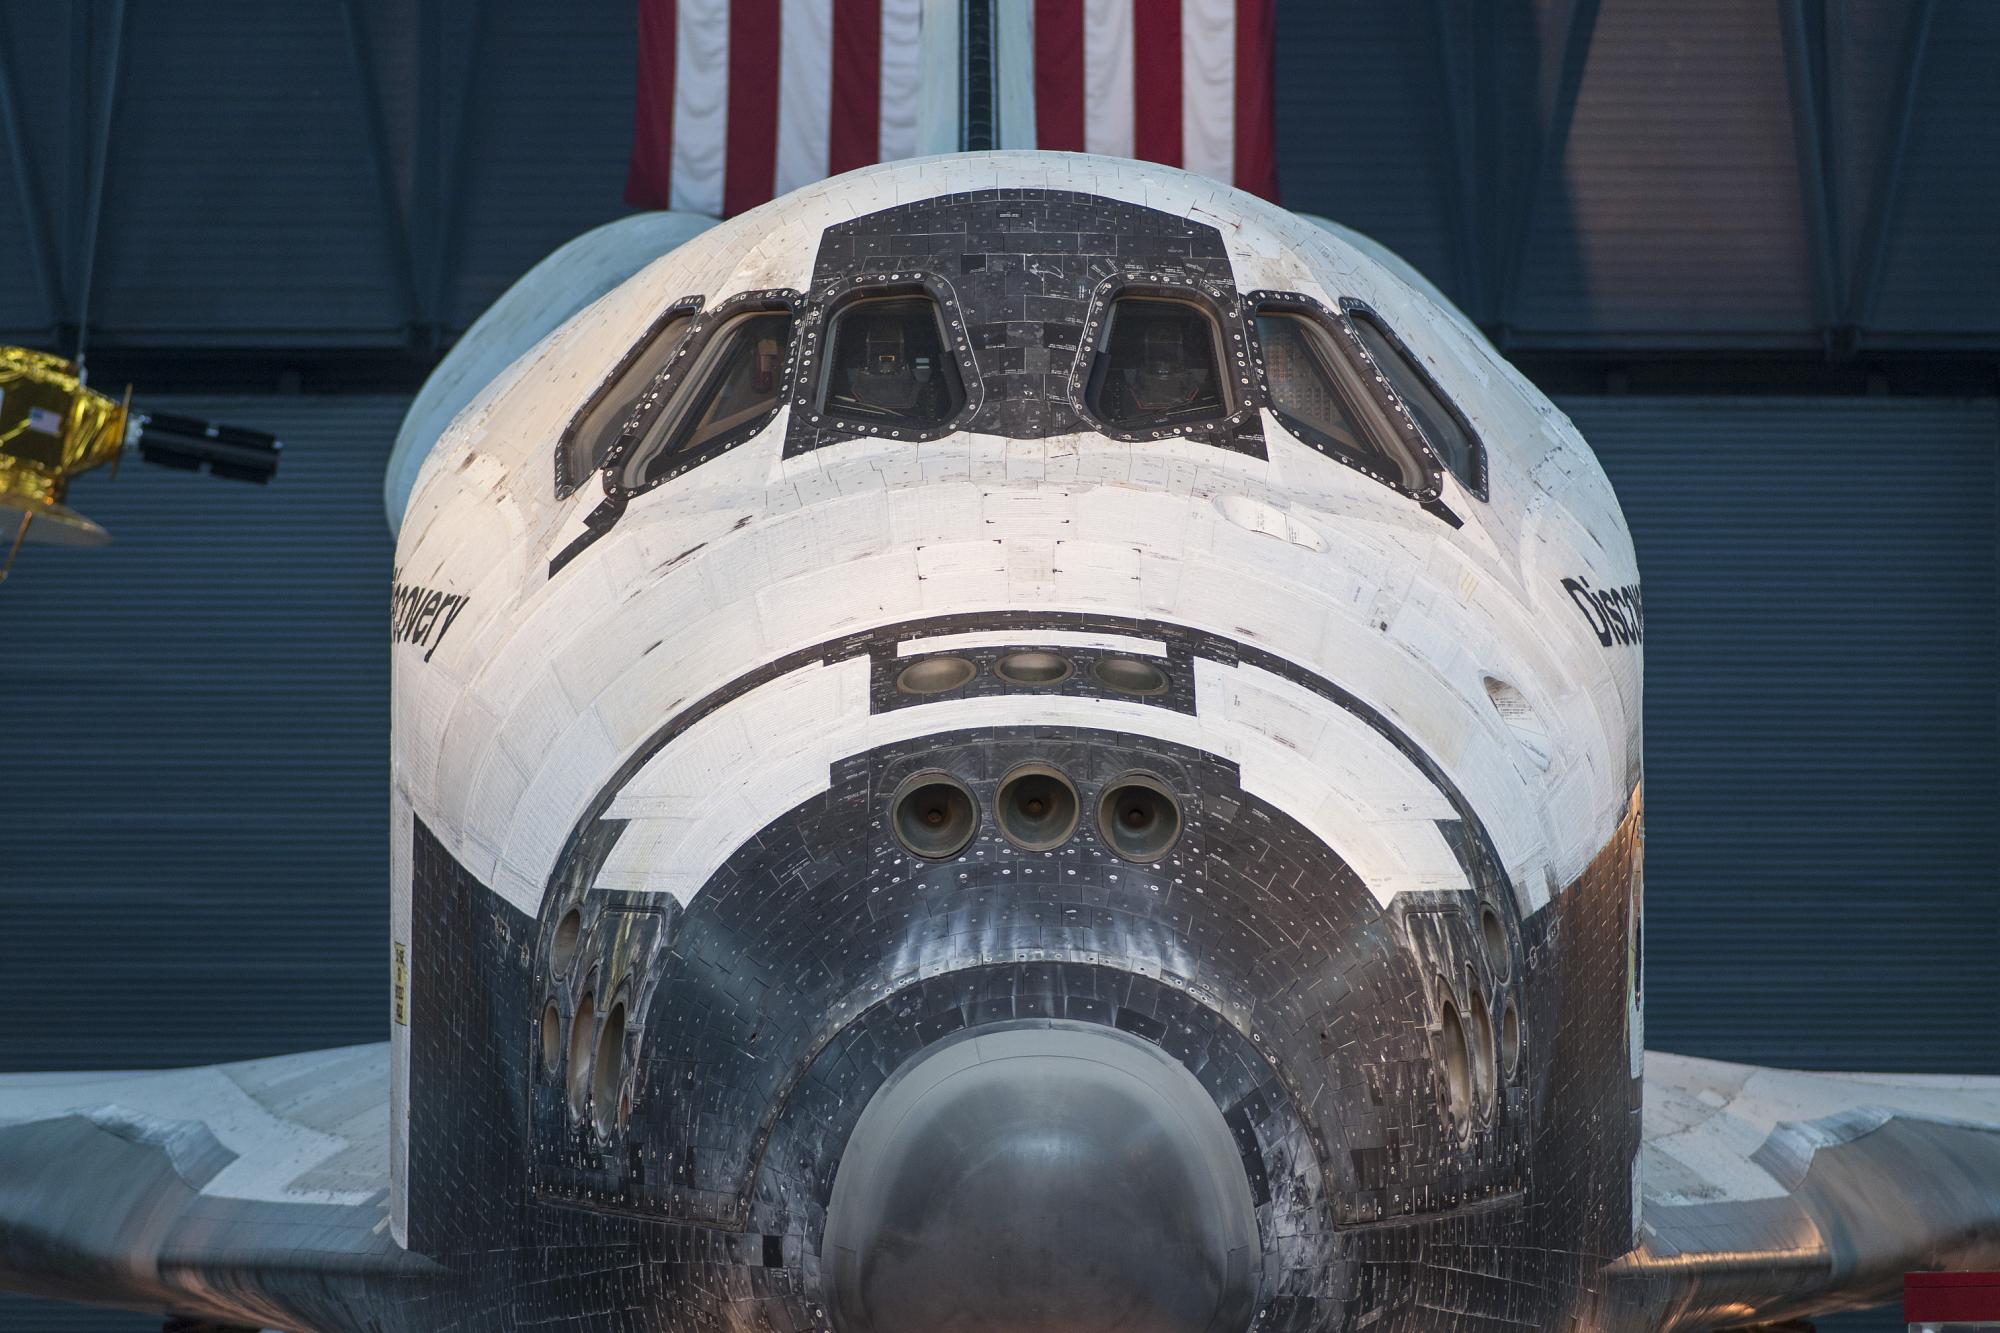 Space shuttle photo